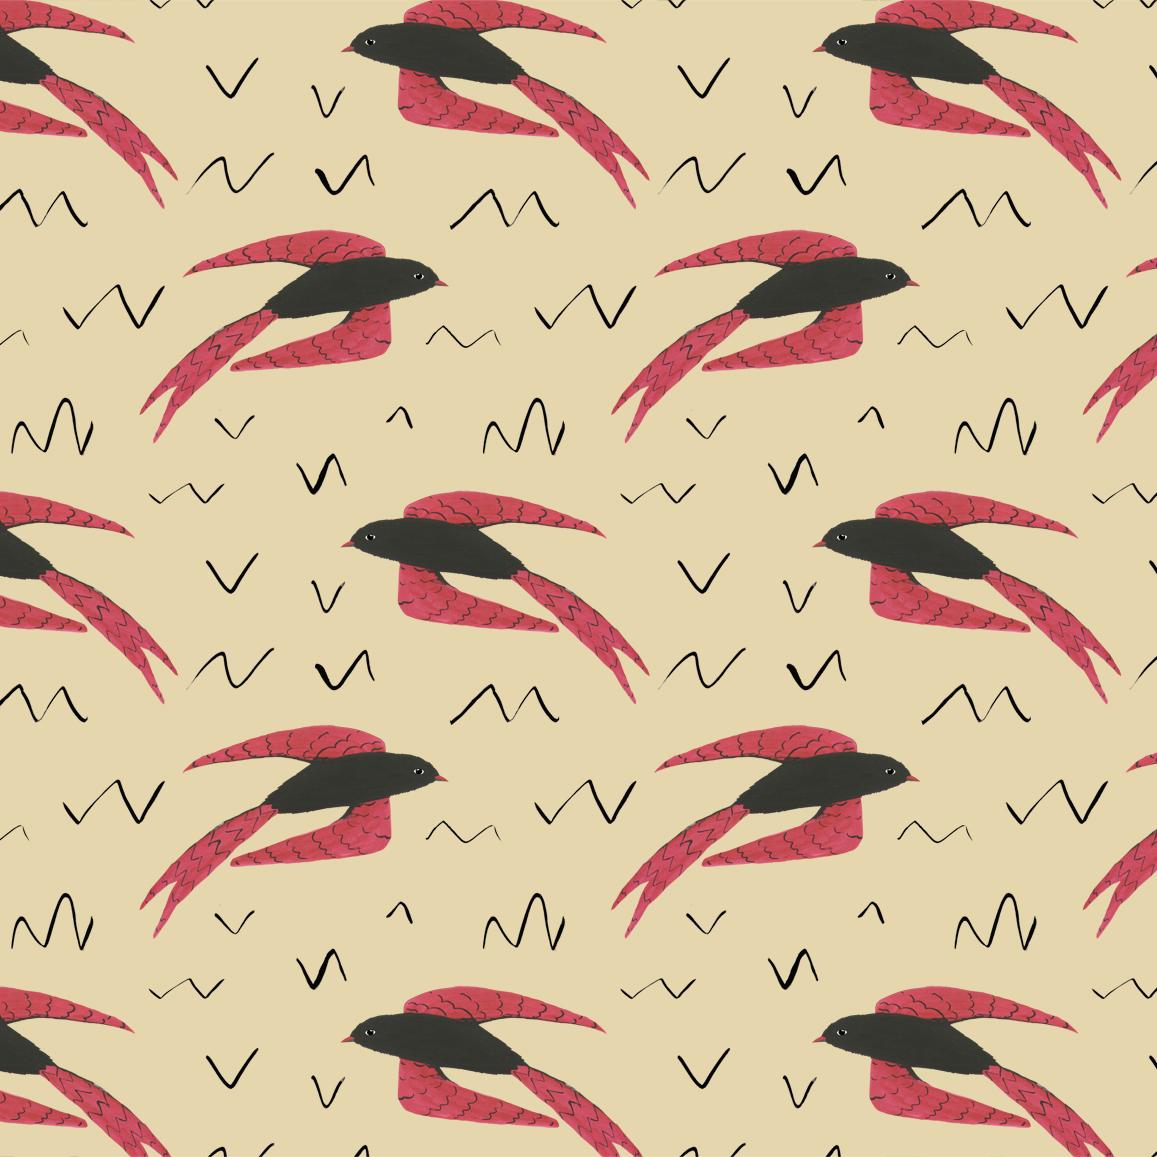 zigzag bird pattern.jpg